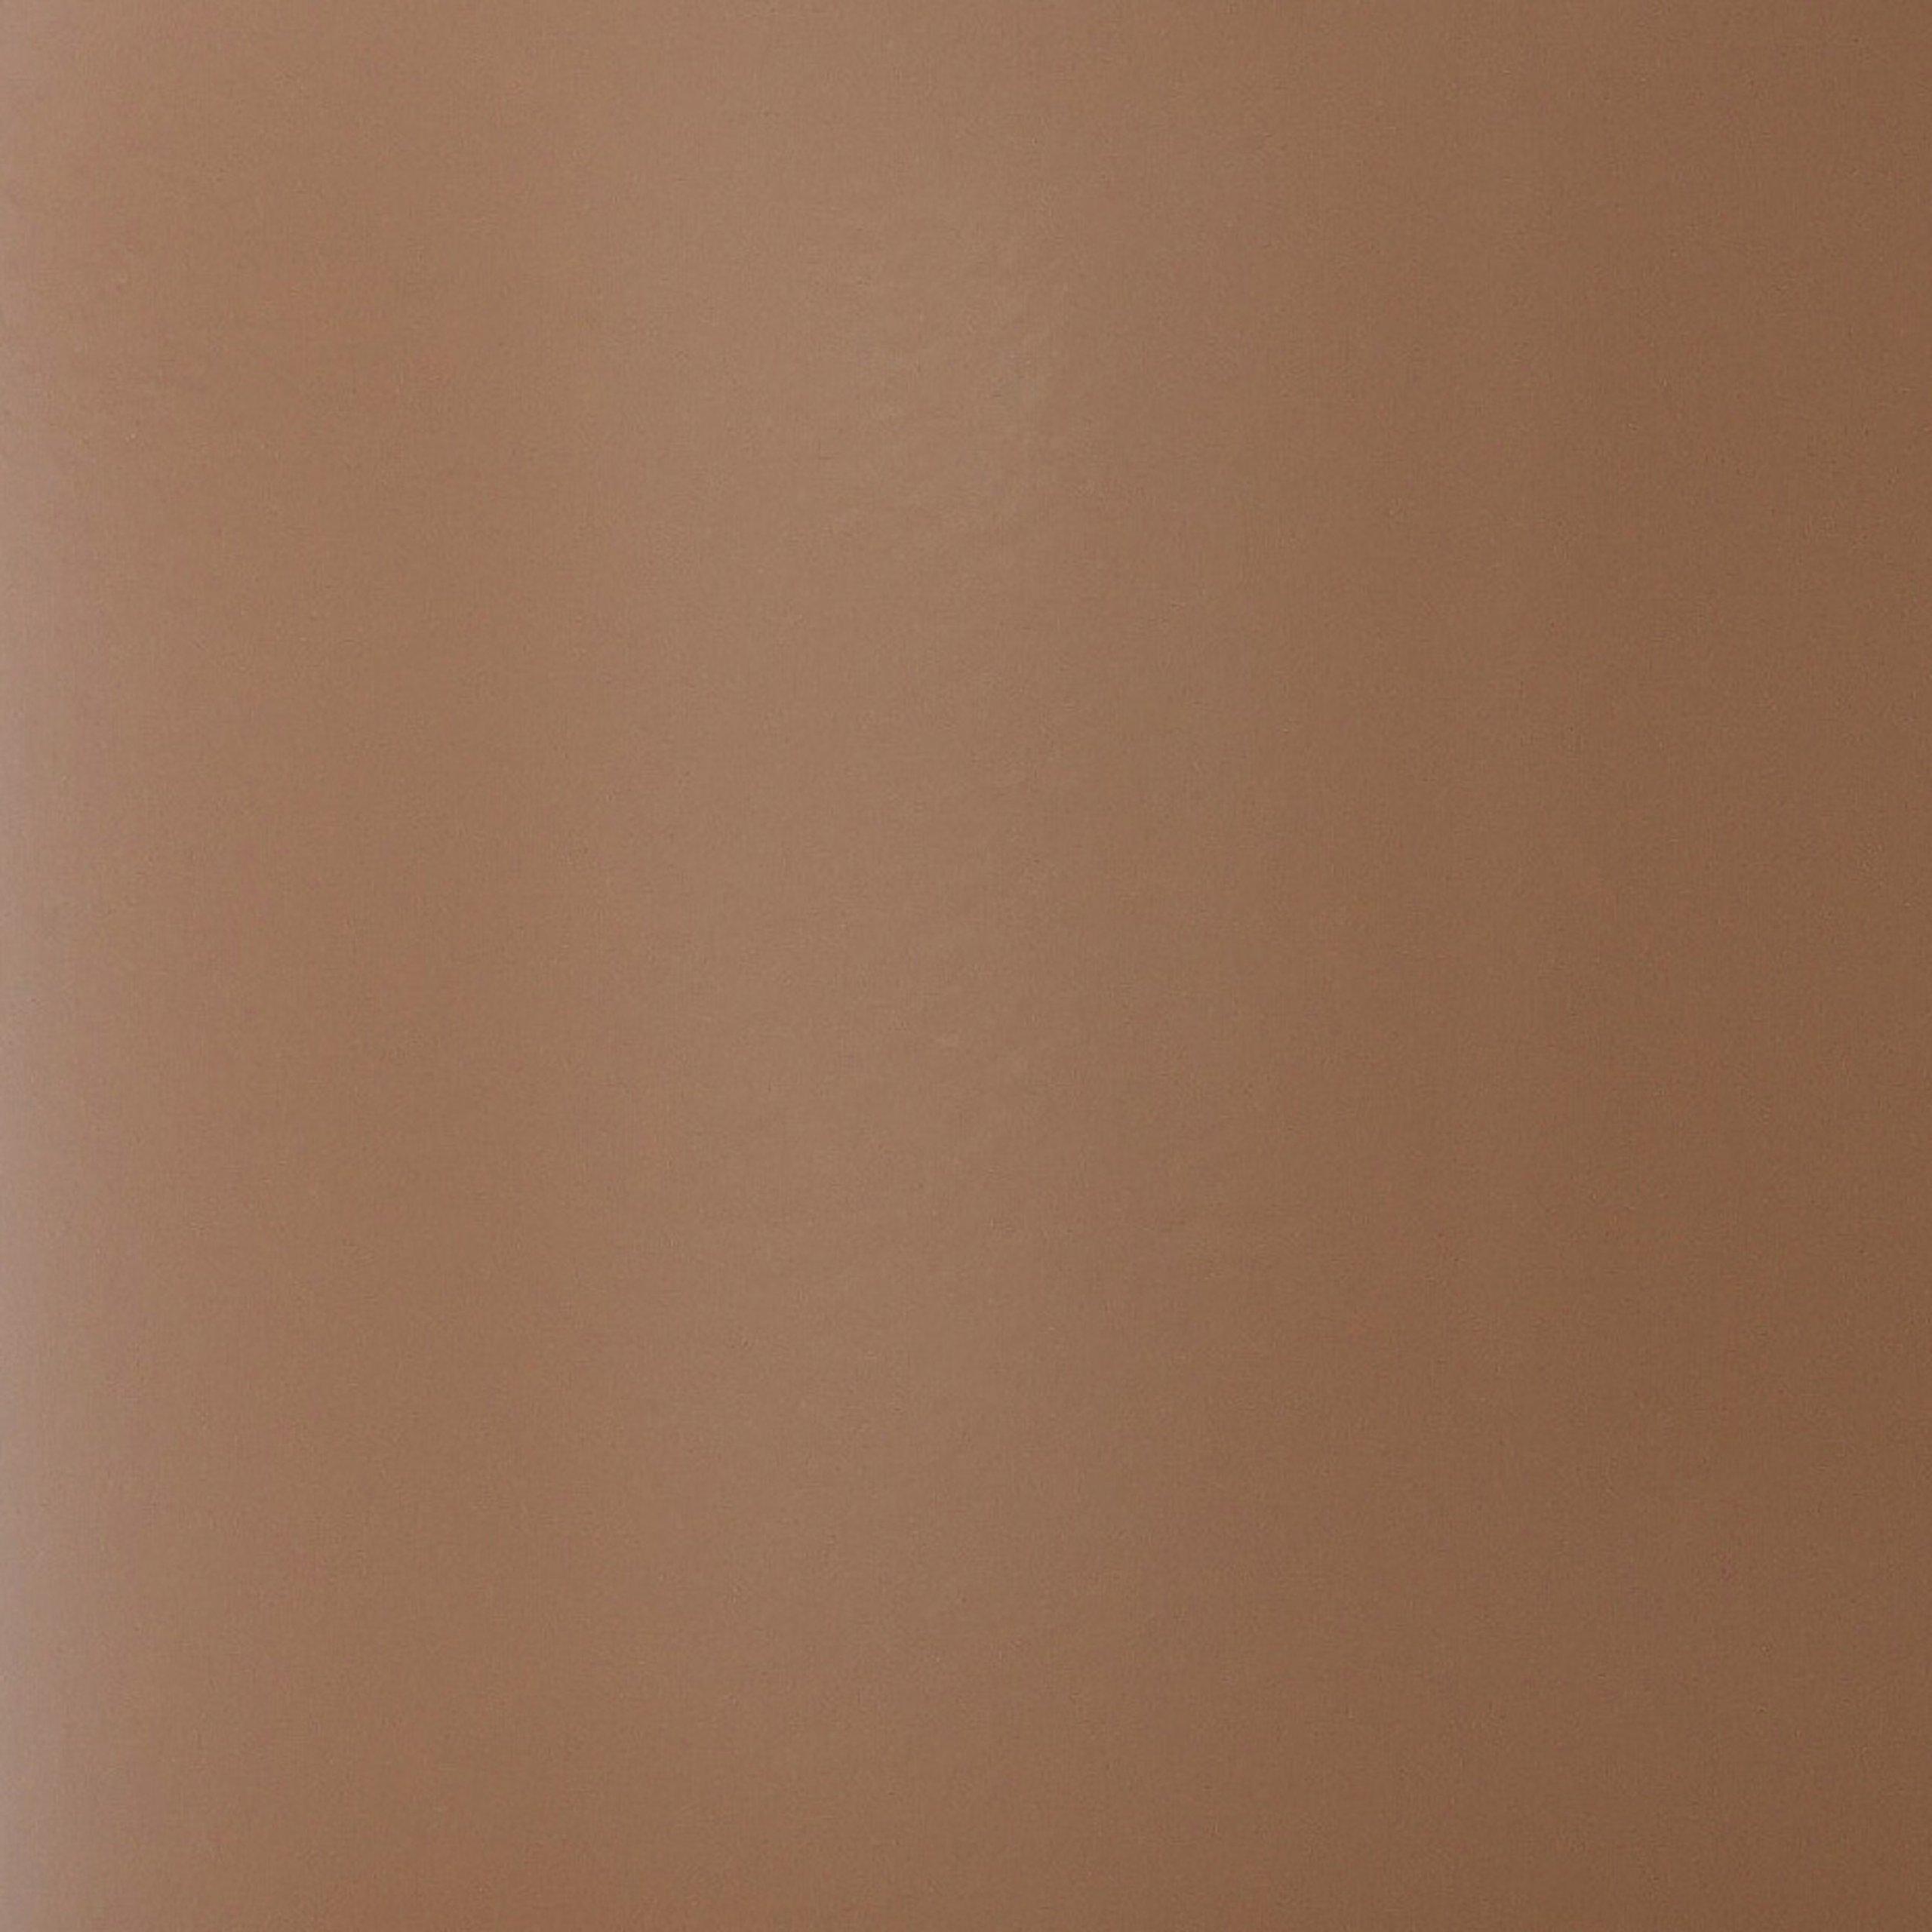 Rachael Ray Cucina Hard Porcelain Enamel Nonstick Covered Round Casserole, 2.5-Quart, Mushroom Brown by Rachael Ray (Image #4)